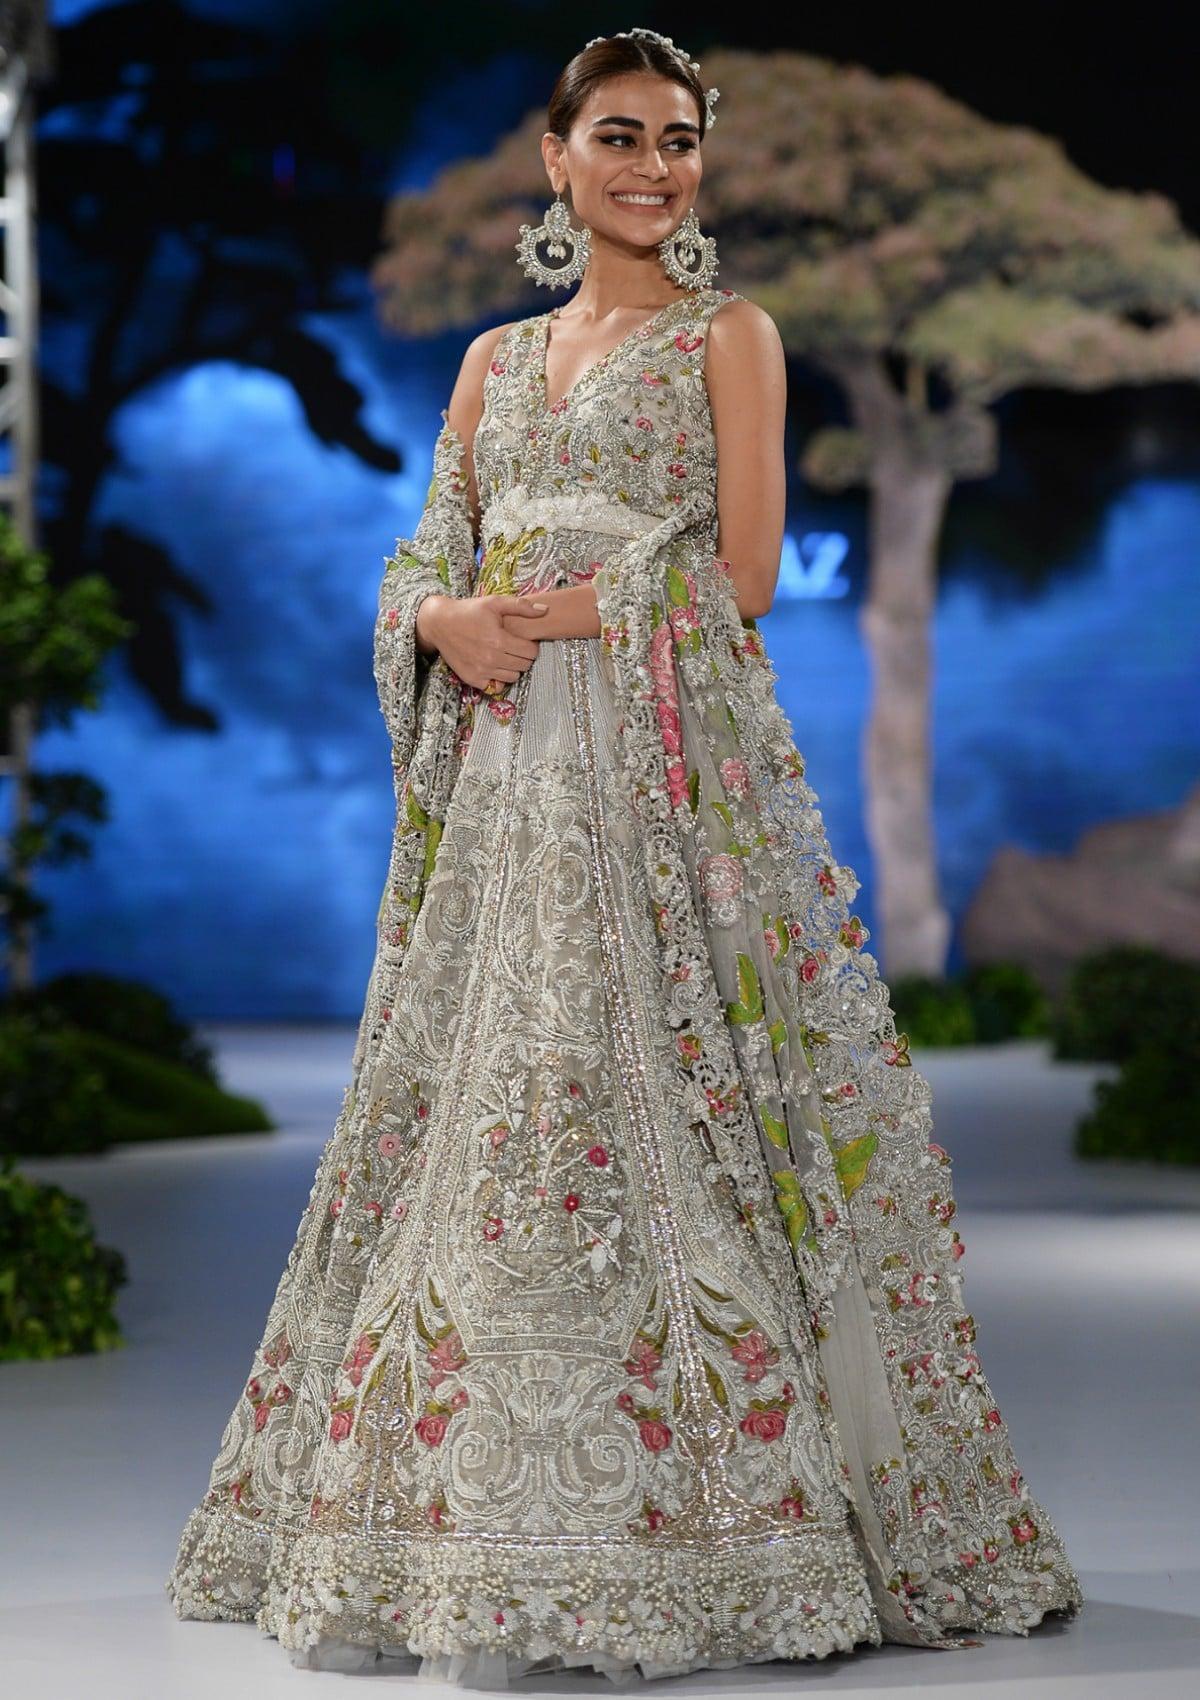 6ebdbcb526 This beautiful jora is princess dreams come true... and Sadaf Kanwal knows  it!